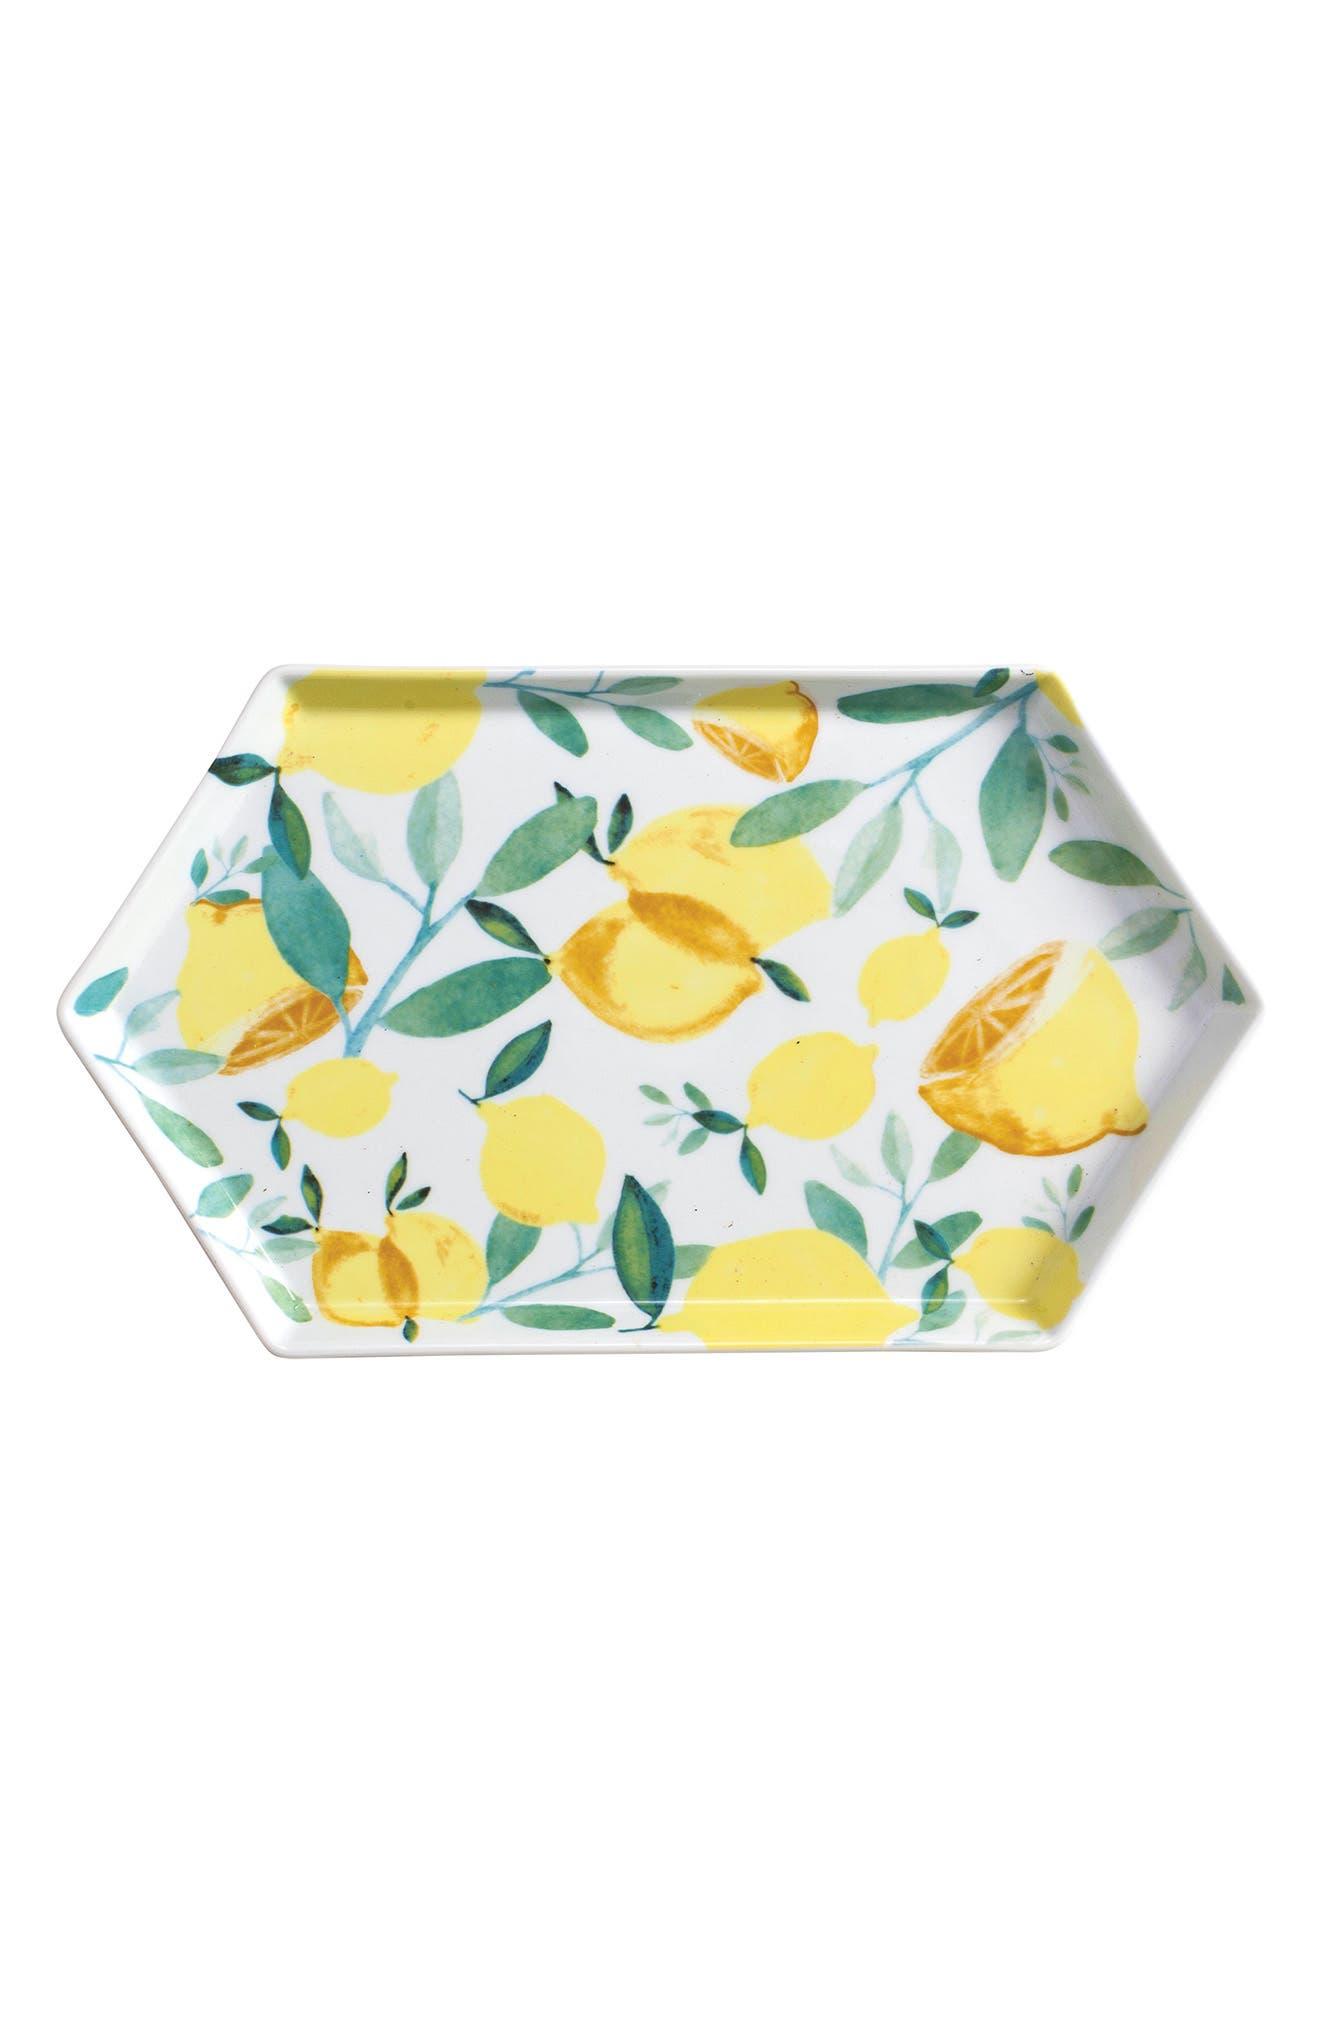 Alternate Image 1 Selected - Rosanna Lemon Hexagon Tray